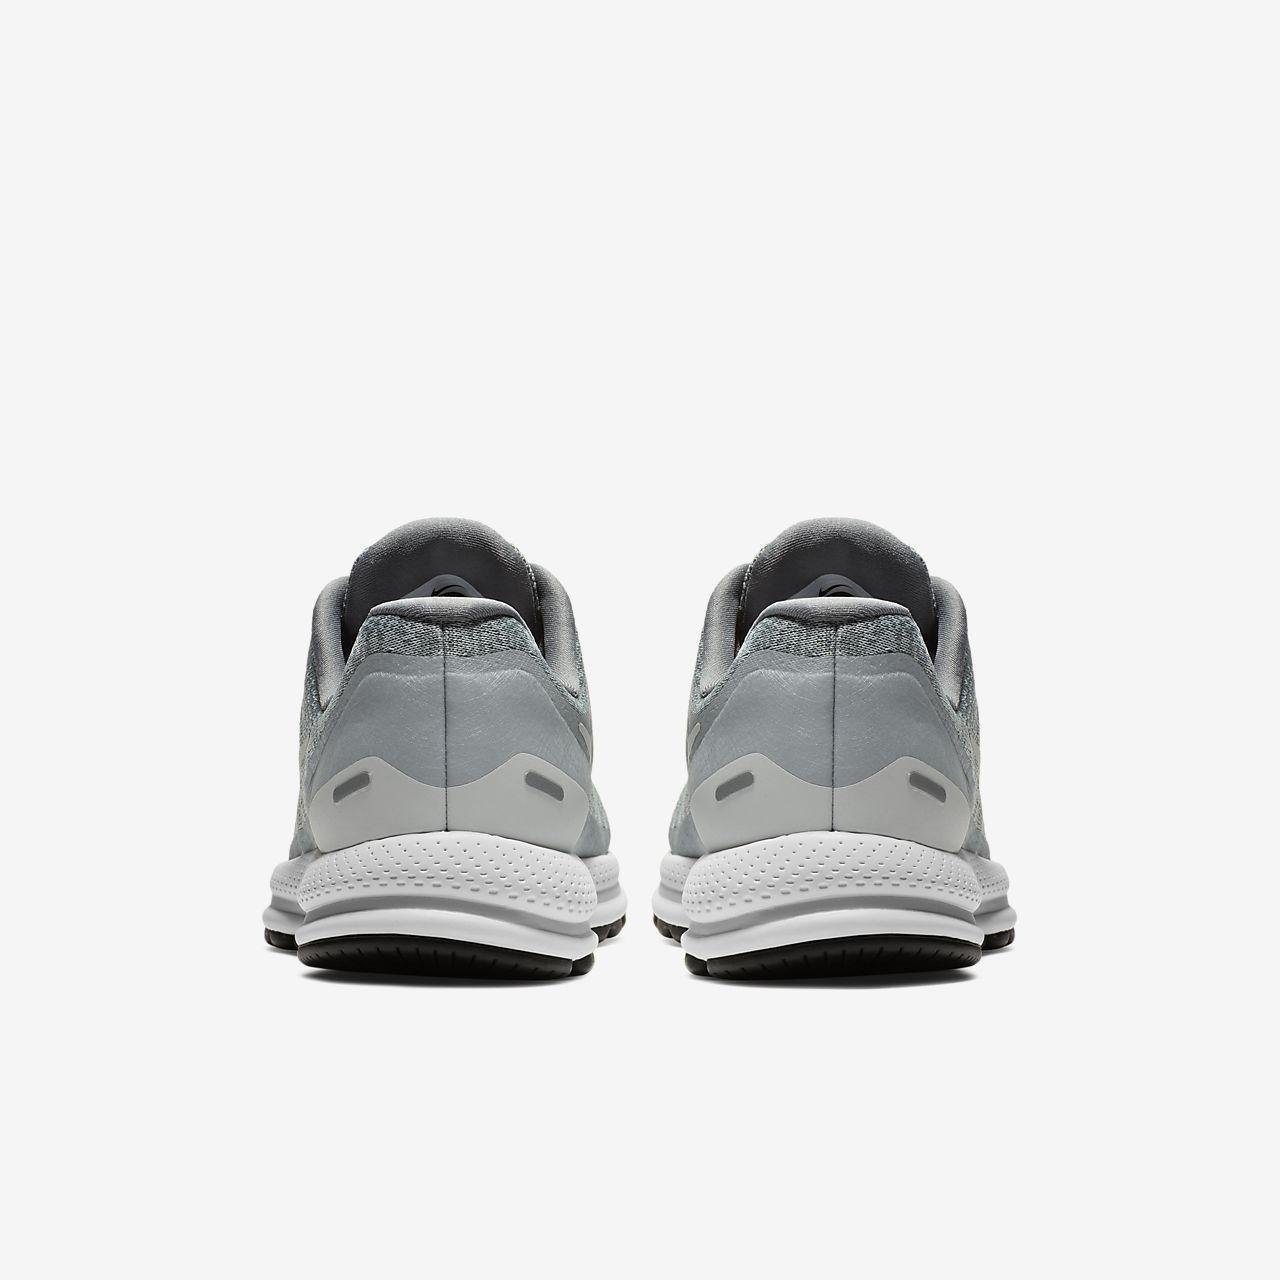 Scarpa da running Nike Air Zoom Vomero 13 Donna